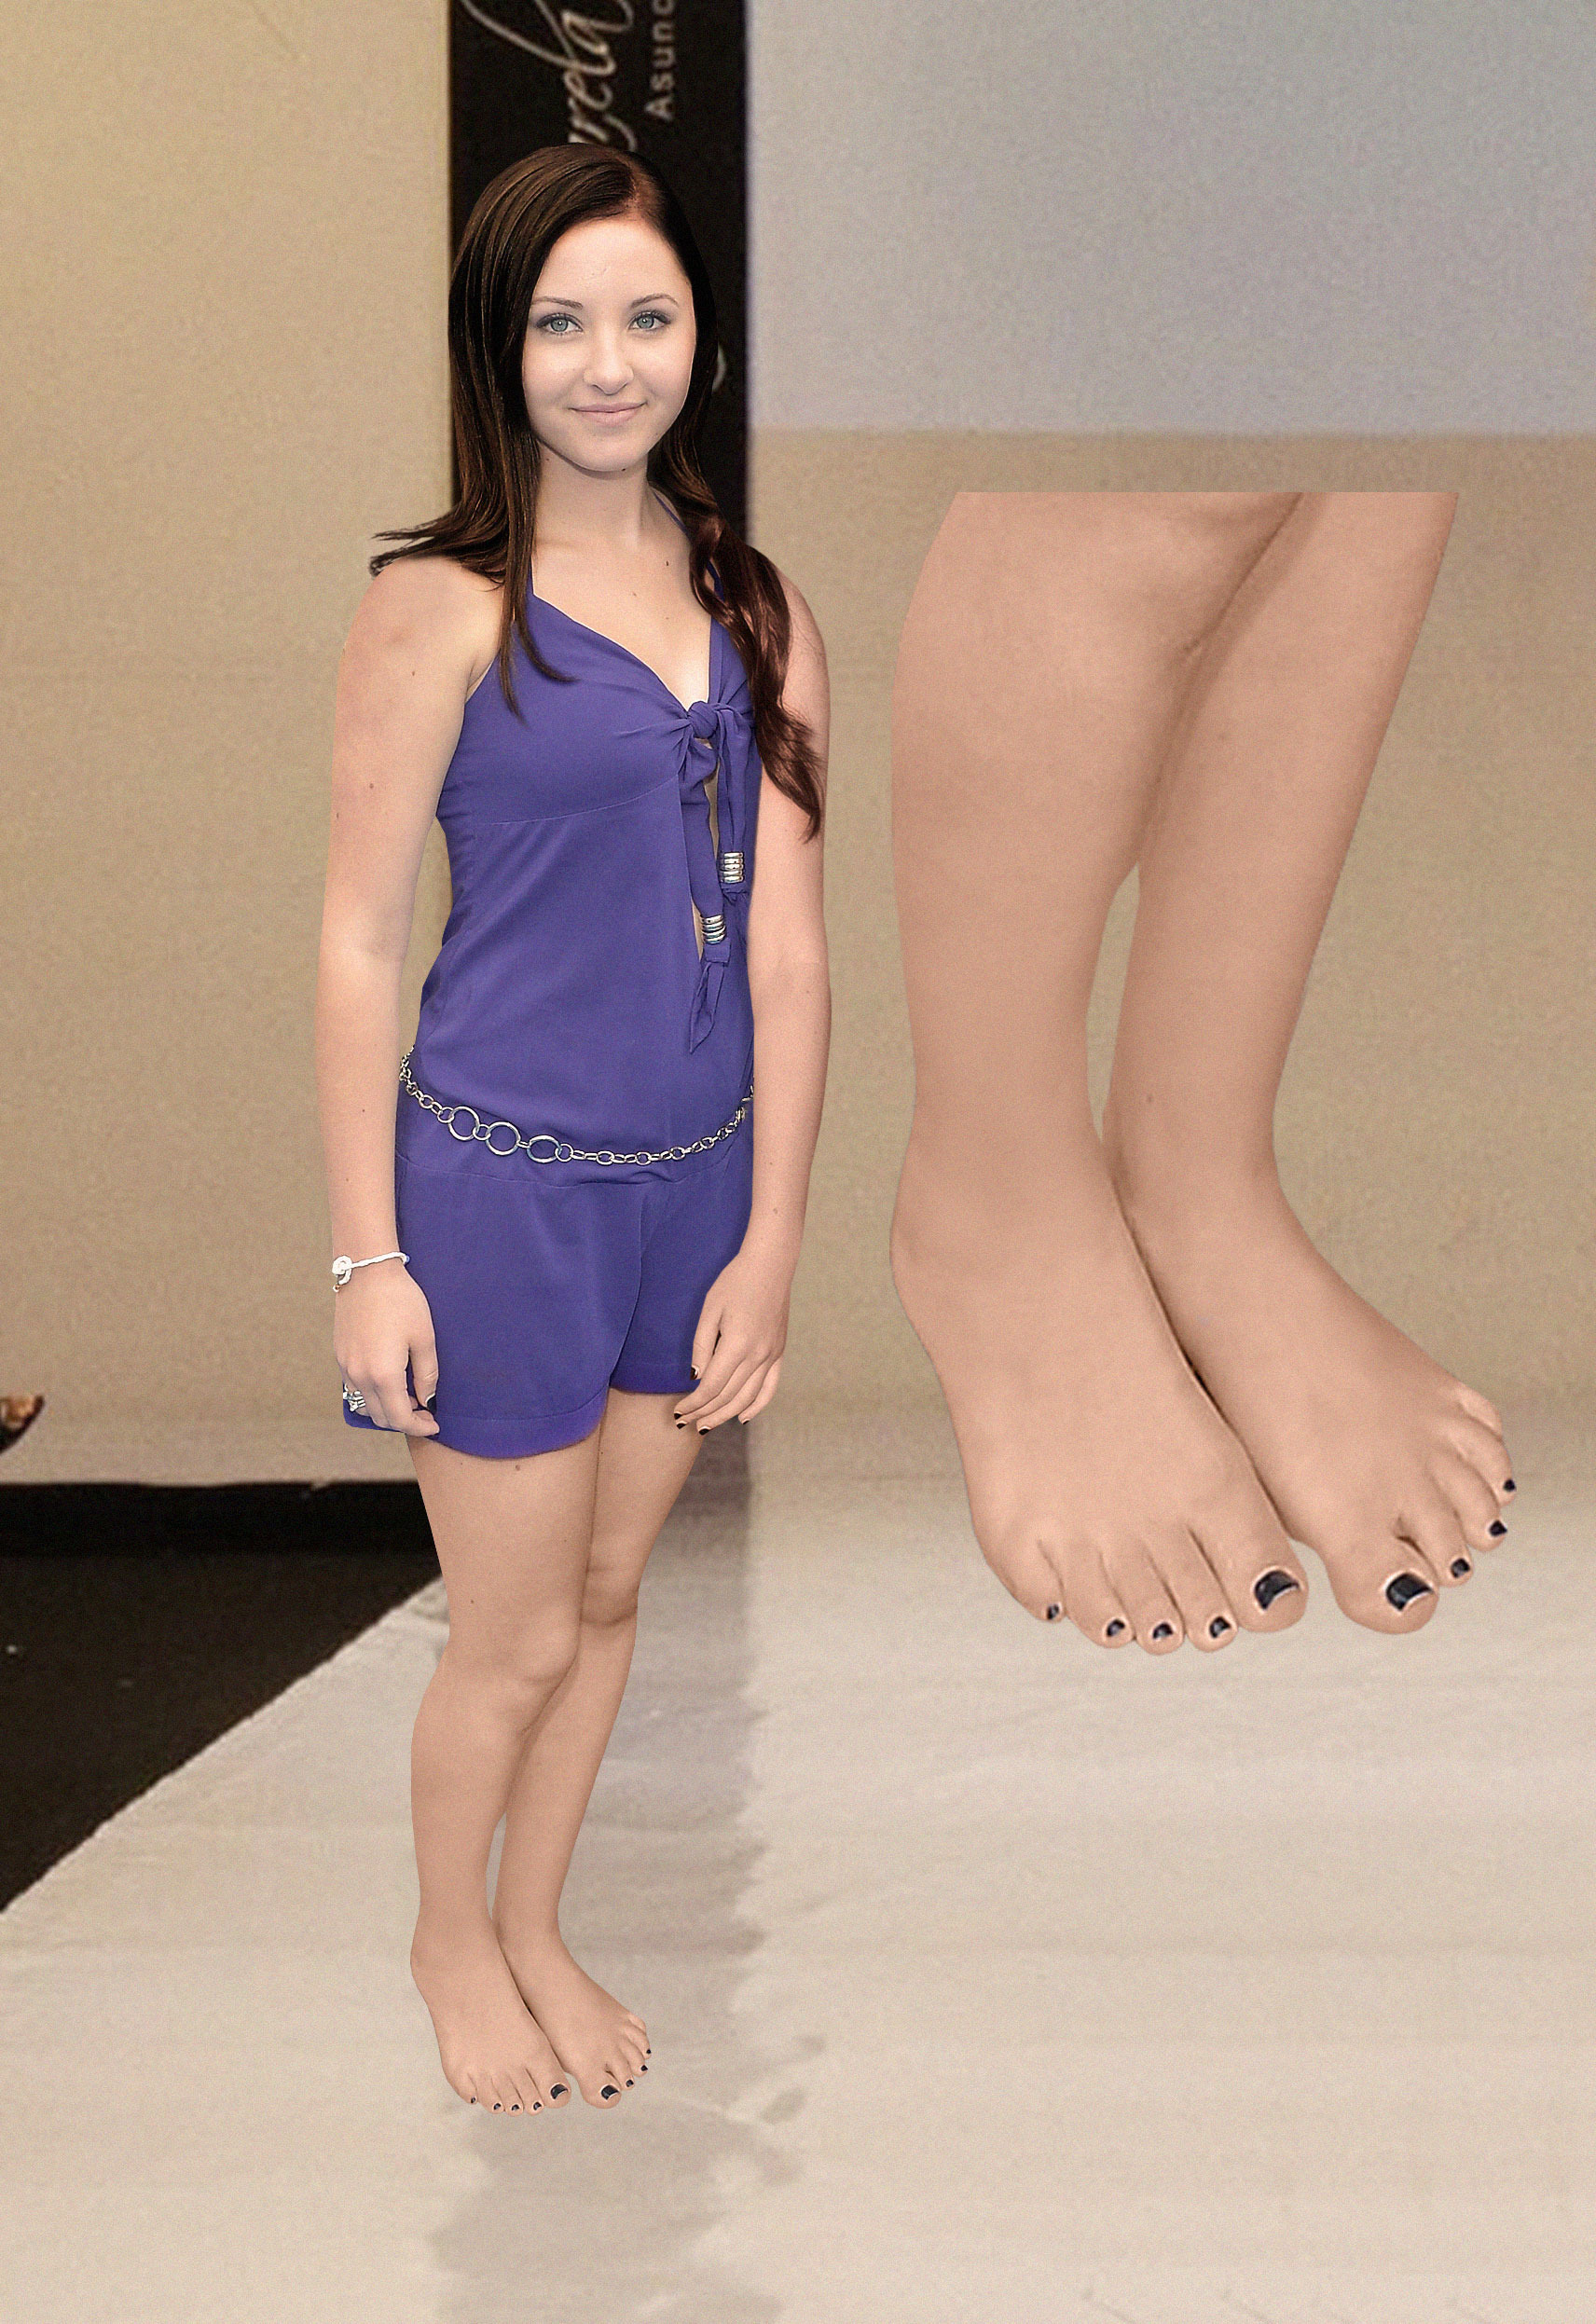 Feet Samantha Fox nude photos 2019